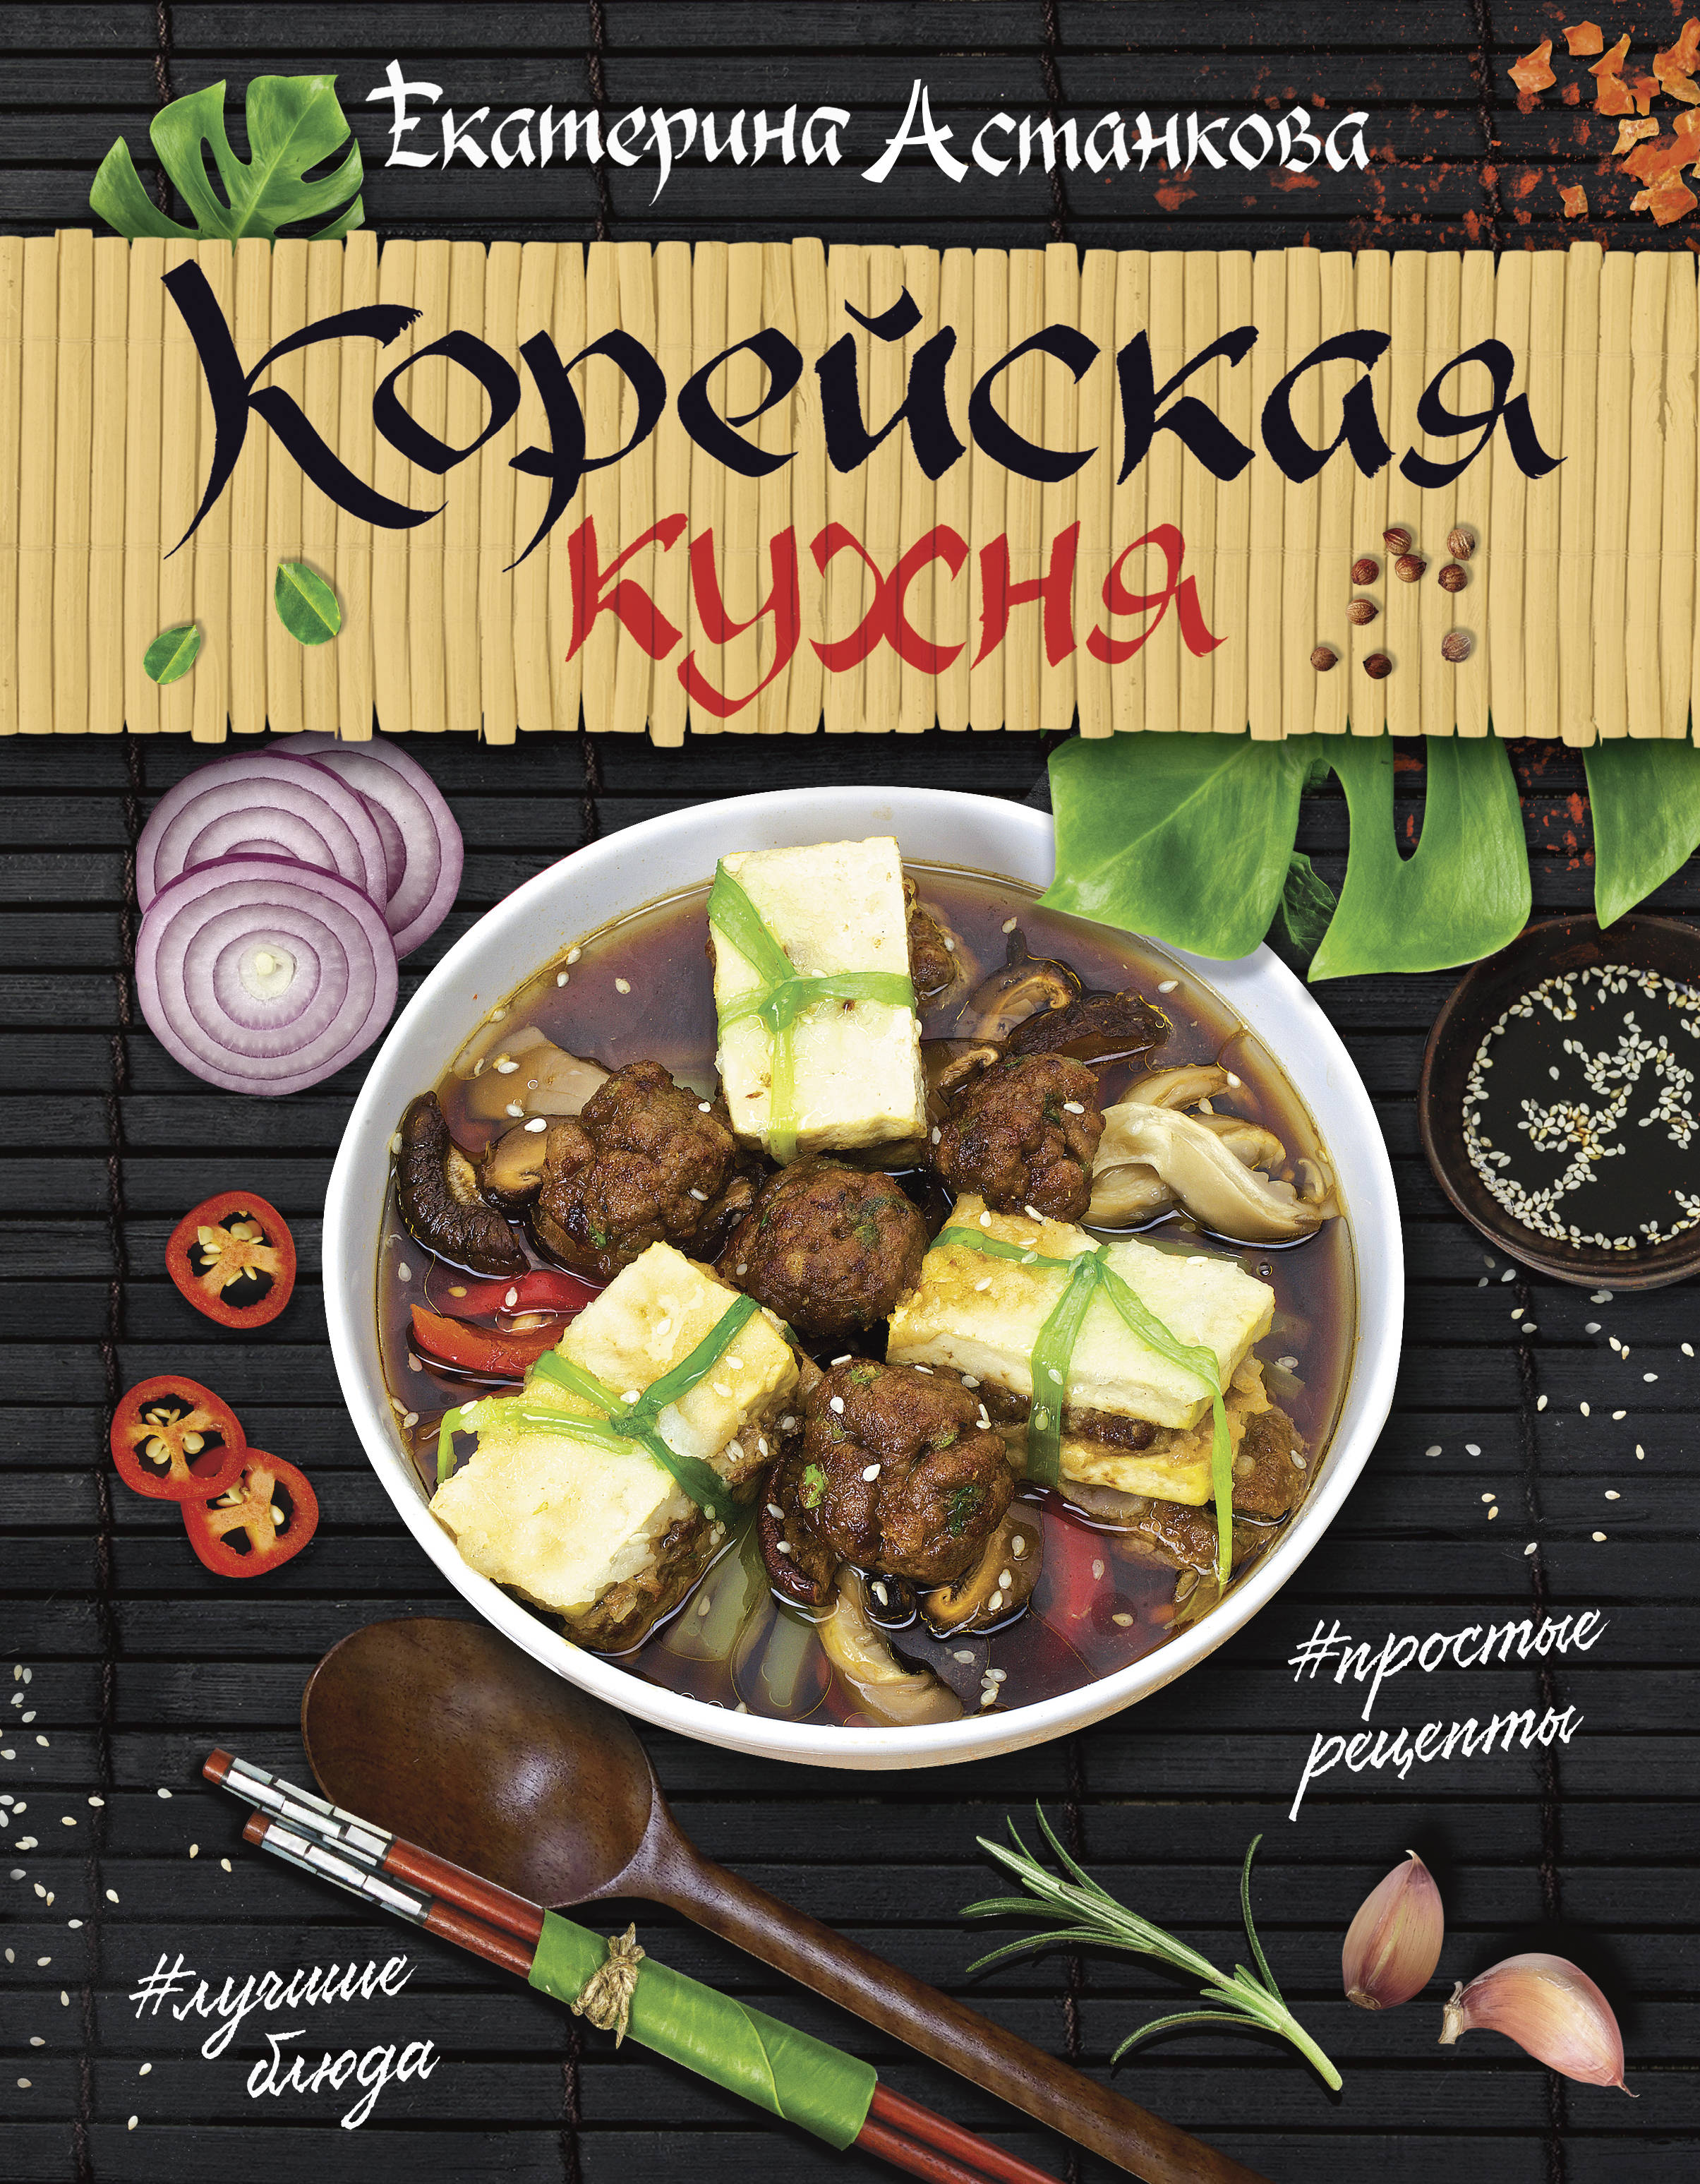 Екатерина Астанкова Корейская кухня